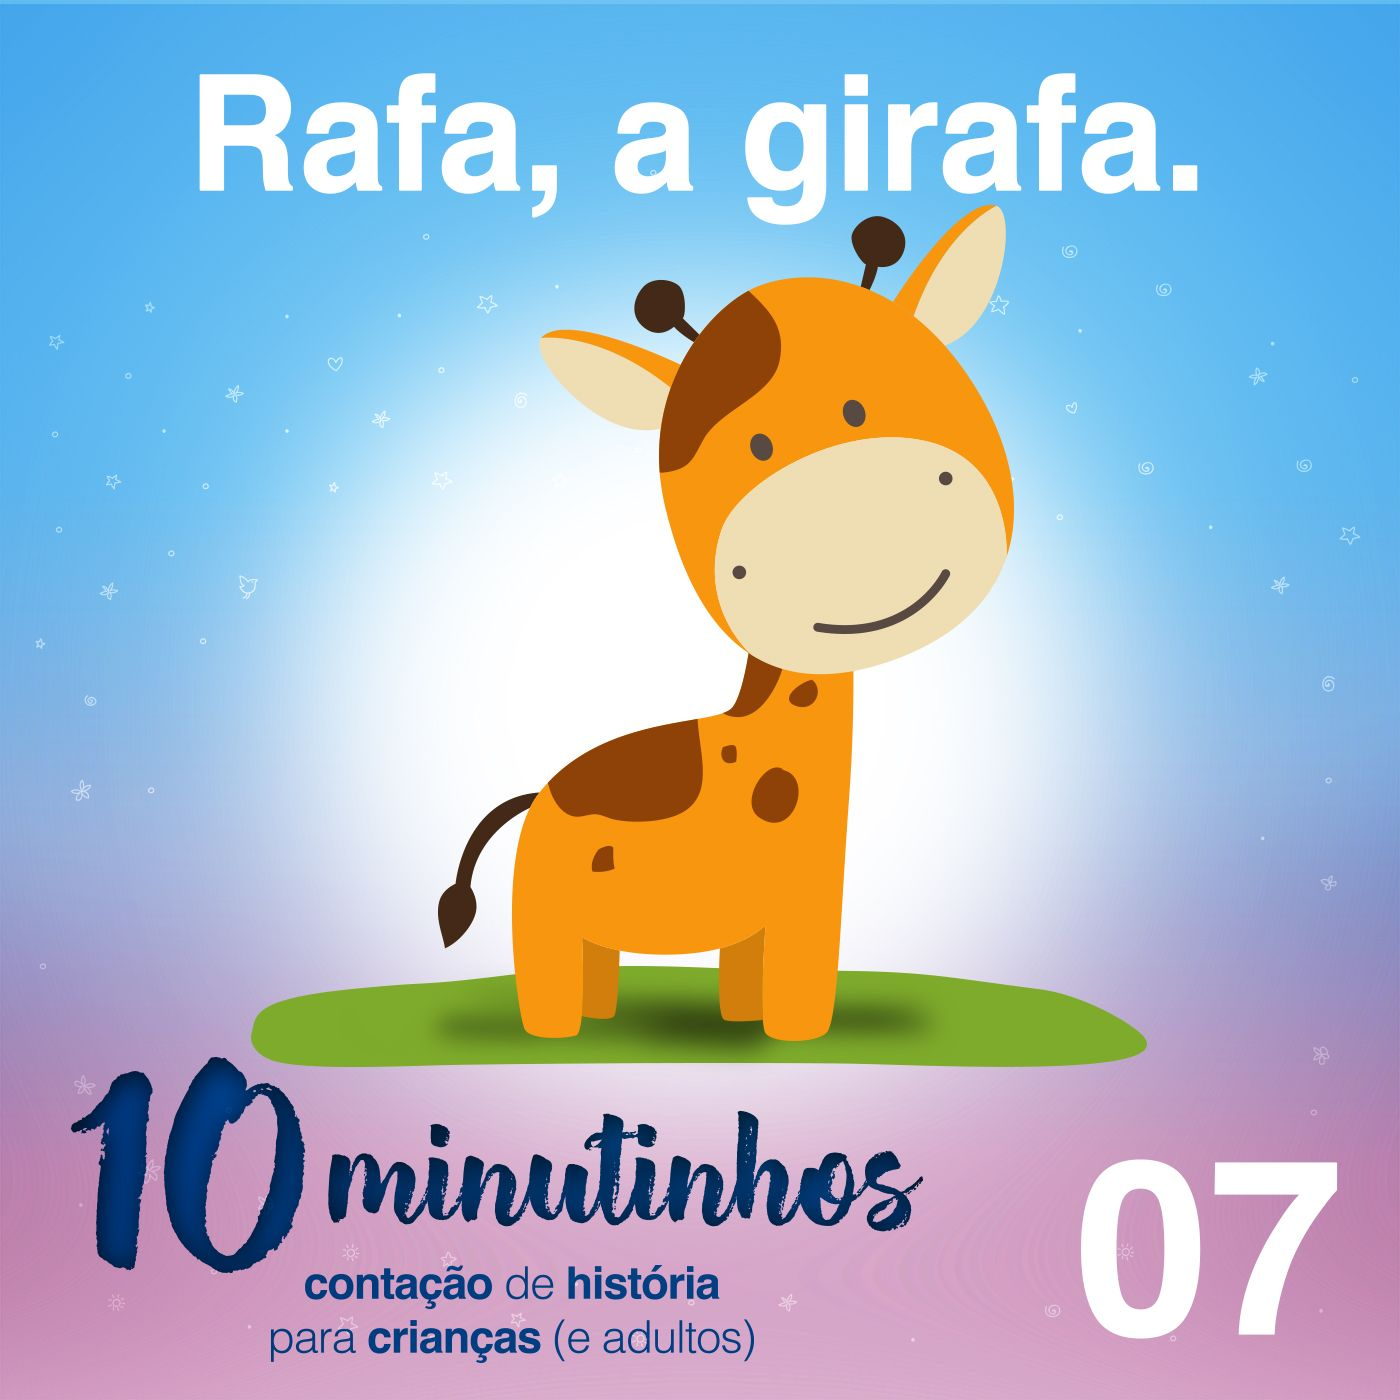 10 Minutinhos #07 - Rafa, a girafa